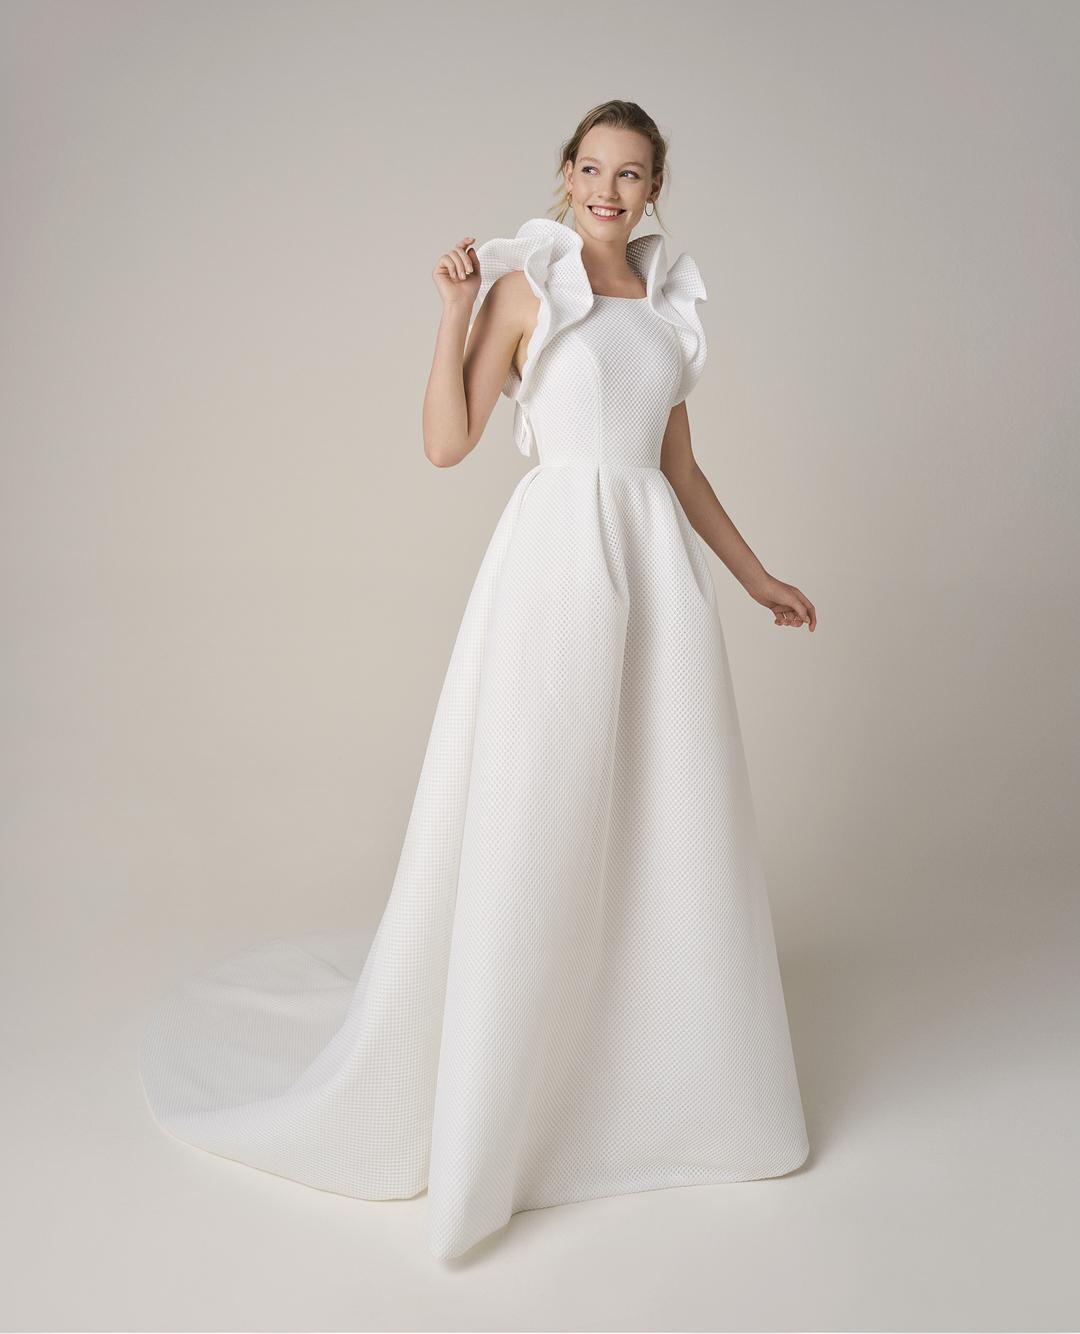 252 dress photo